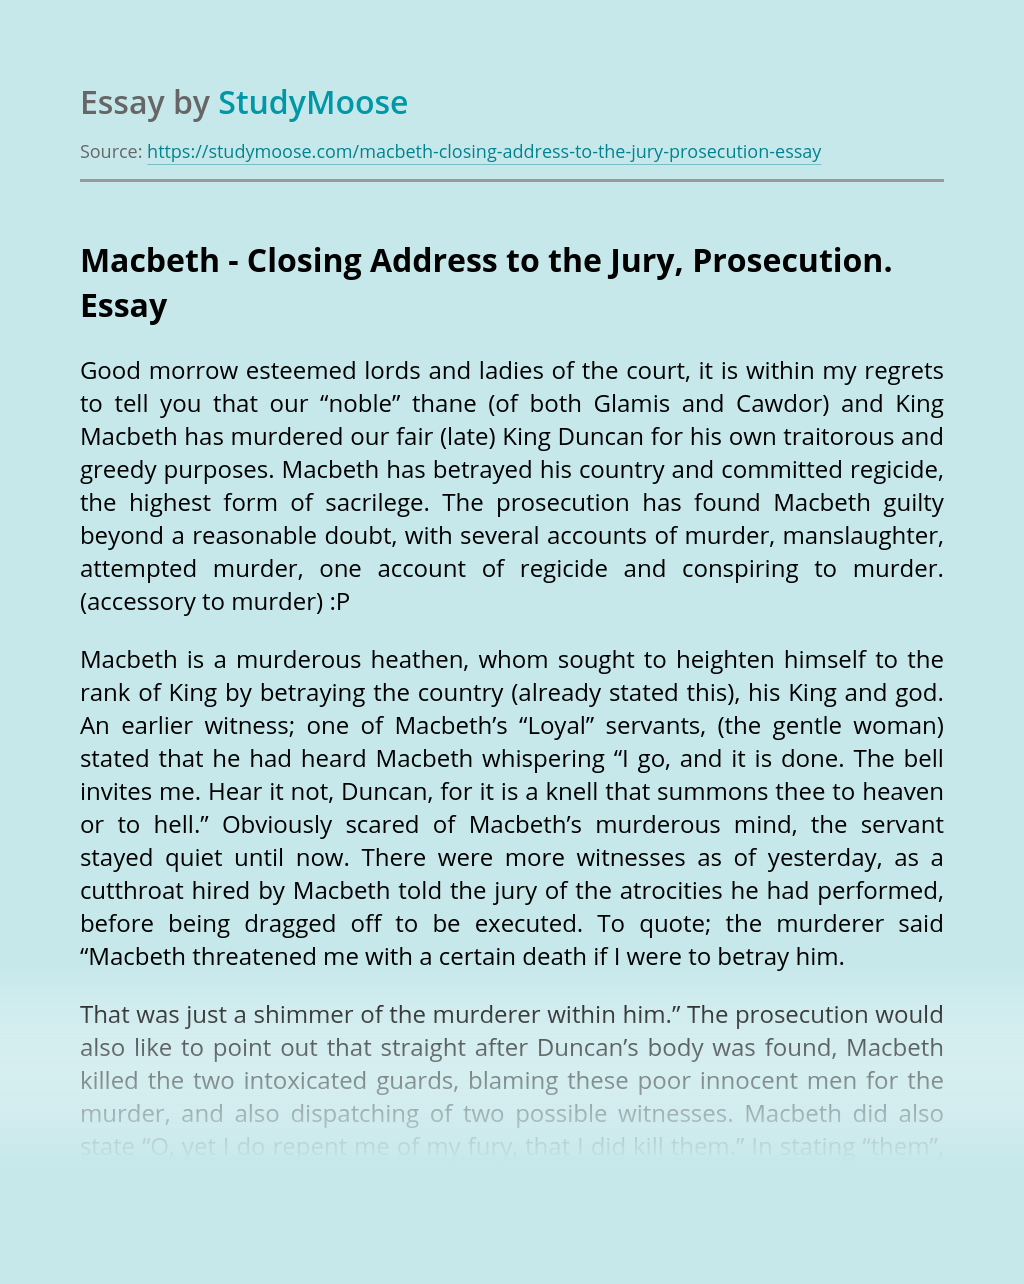 Macbeth - Closing Address to the Jury, Prosecution.